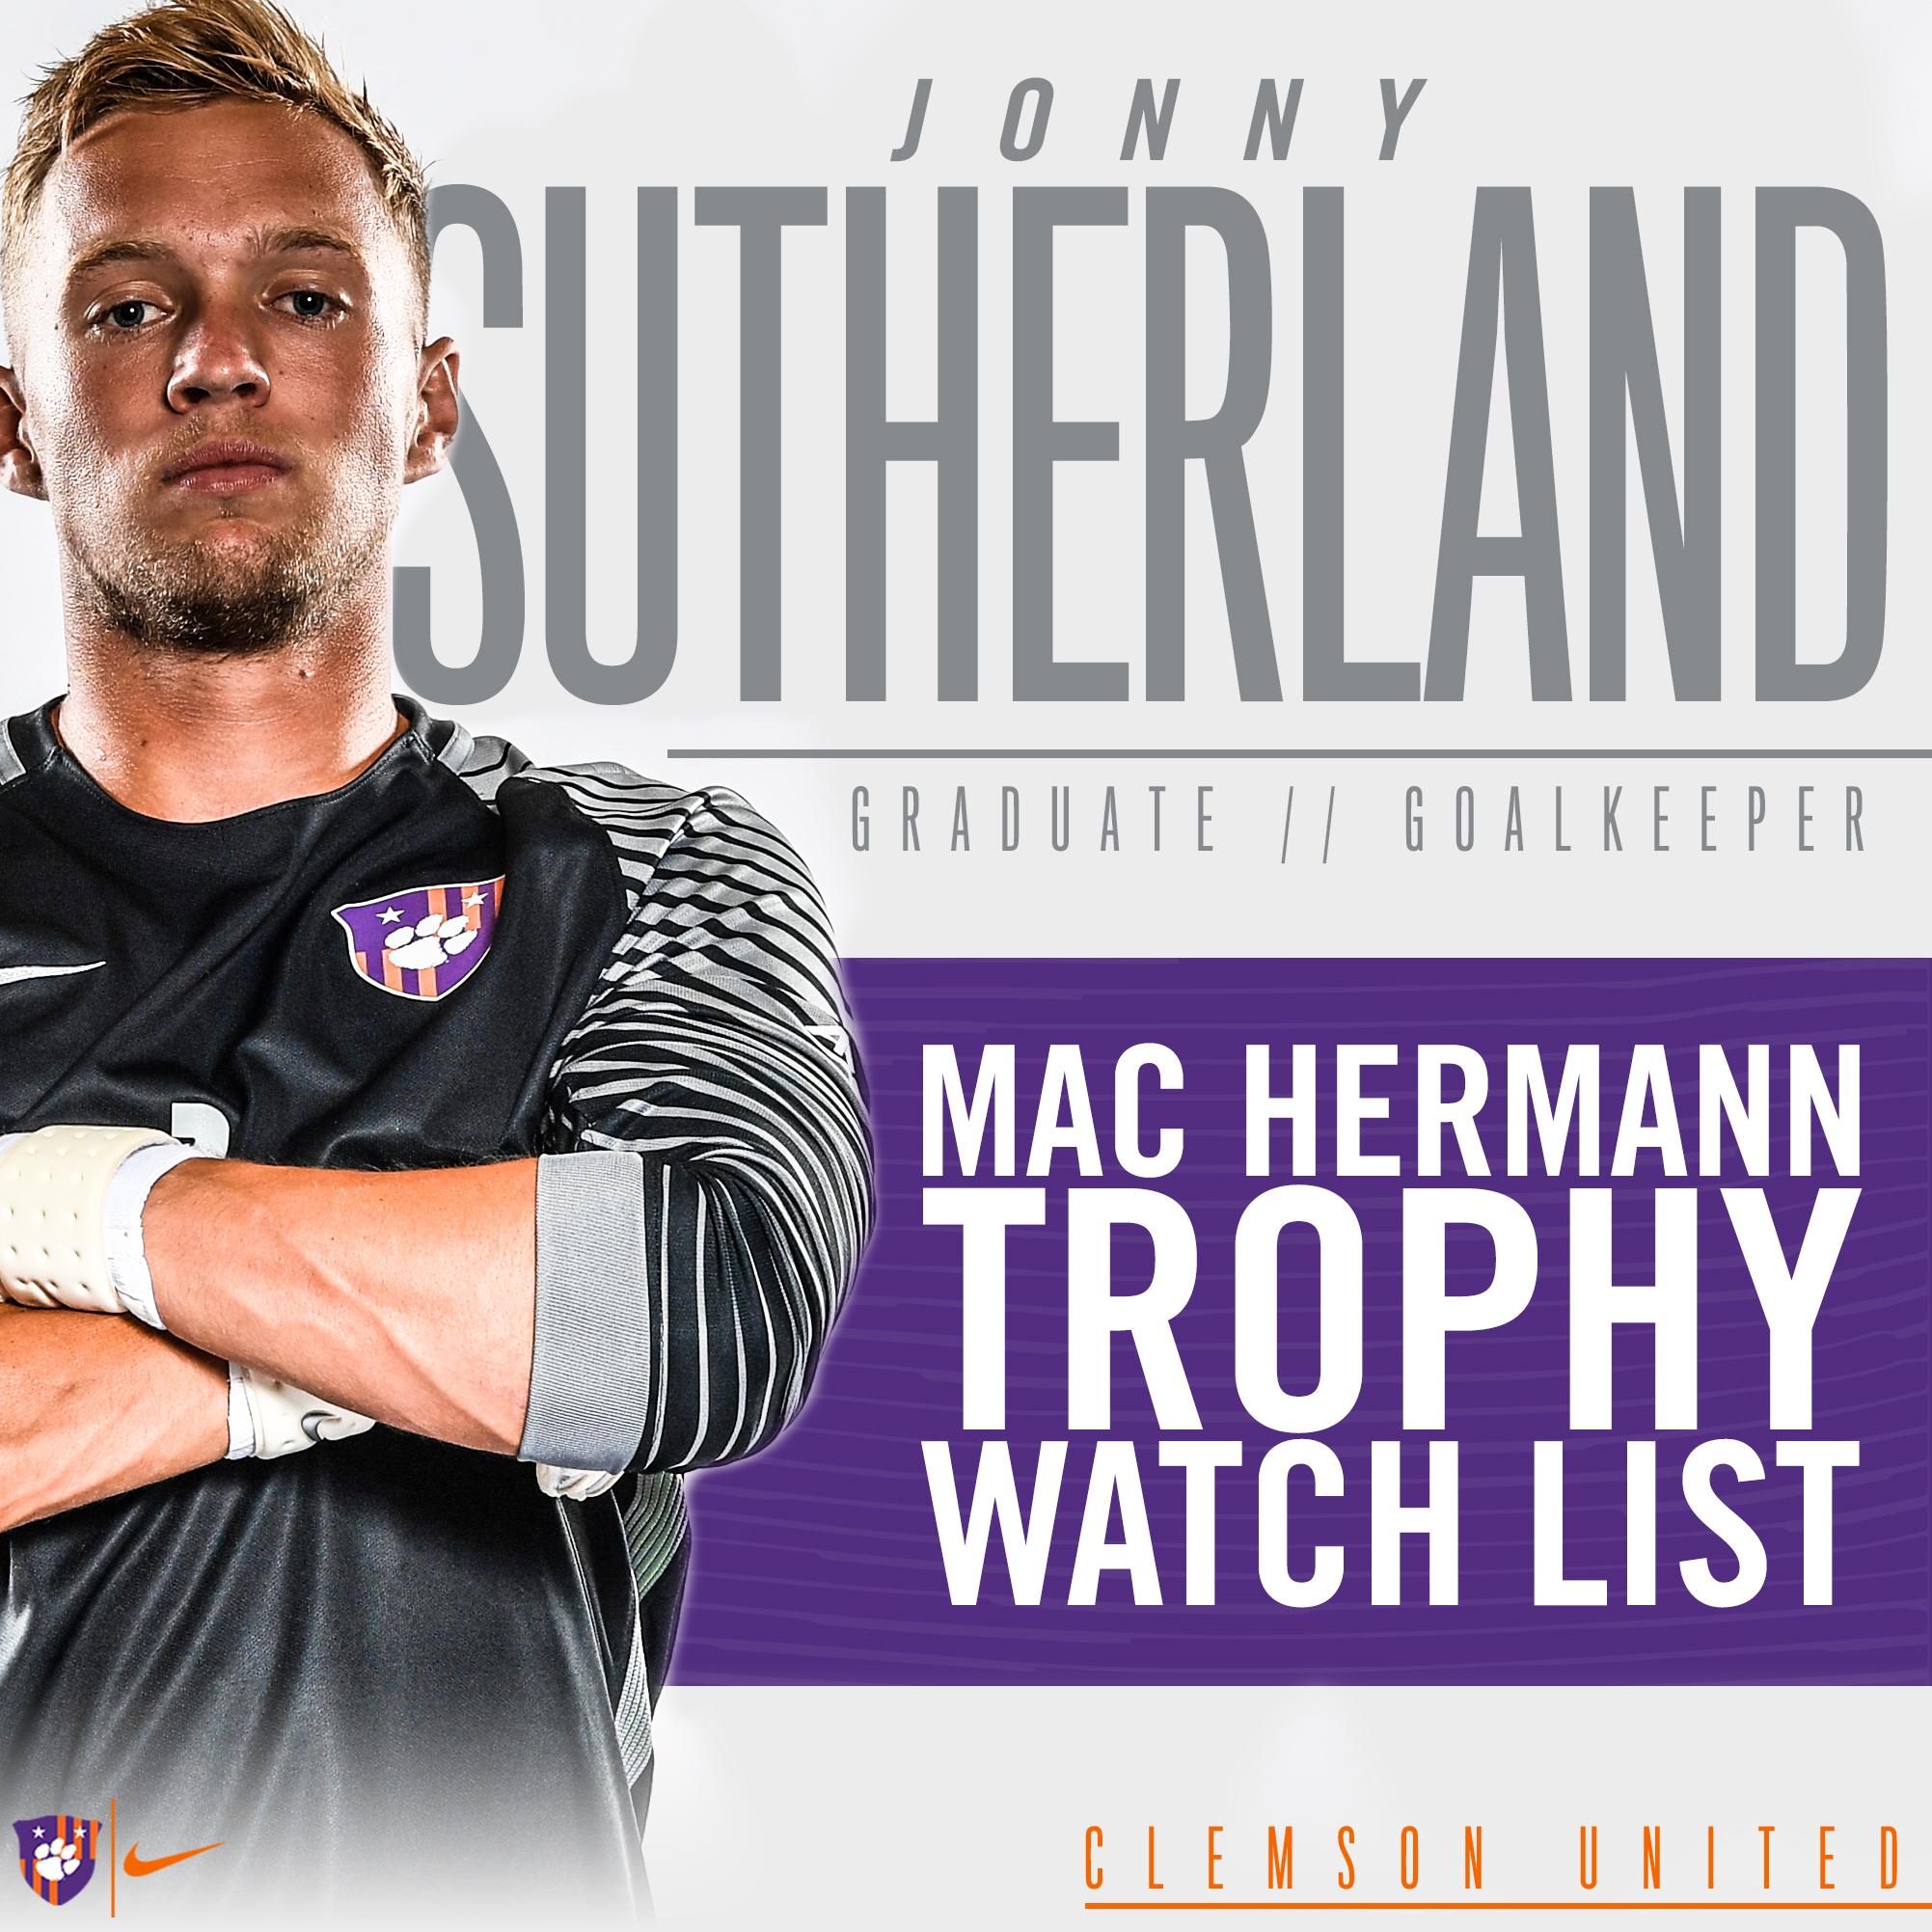 Sutherland Named to MAC Hermann Trophy Watch List